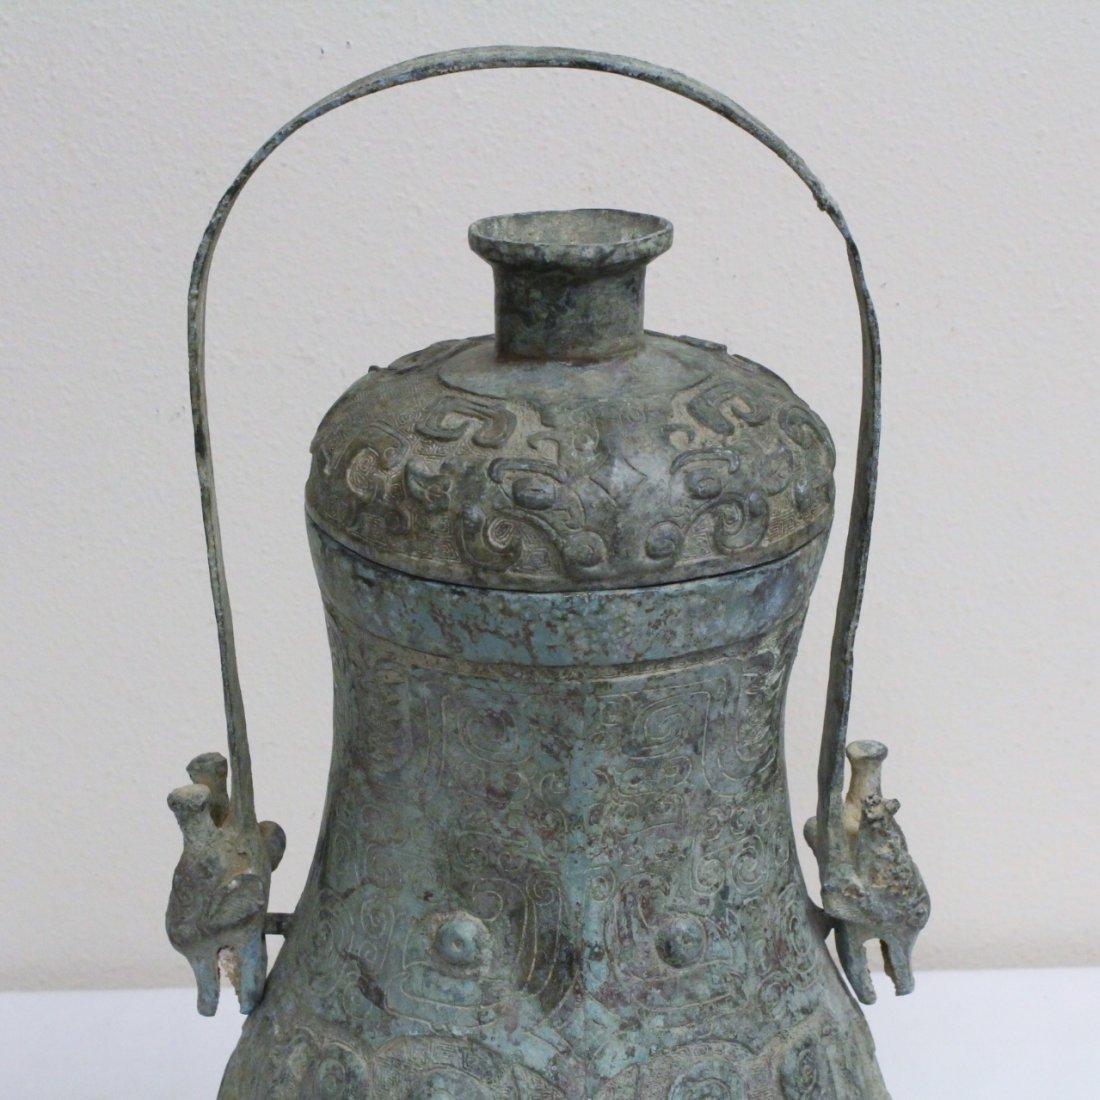 Chinese large bronze handled wine vessel - 3